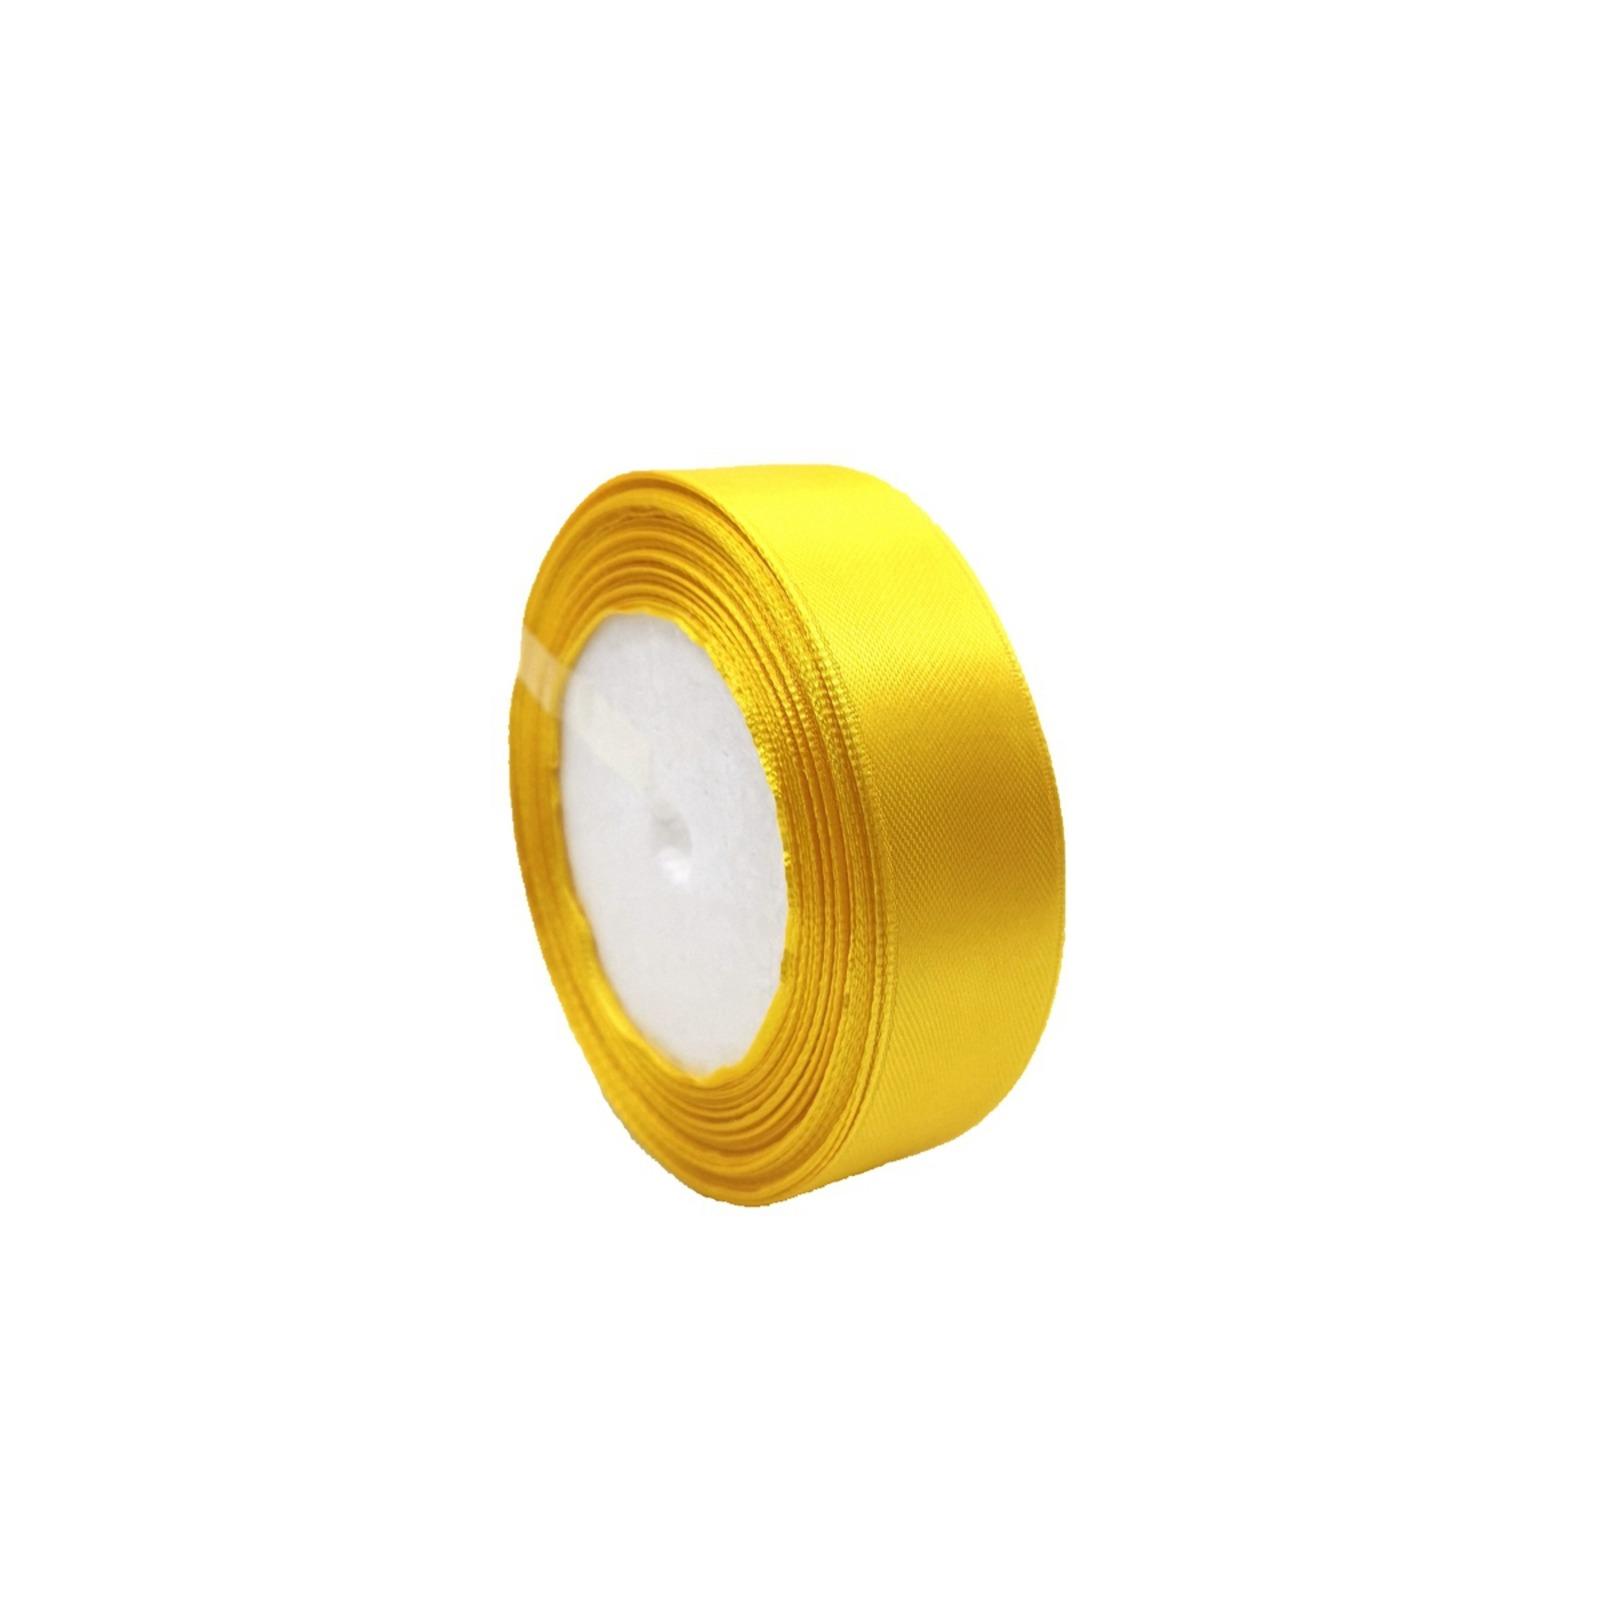 VIP Ribbon 2.5cm x 22.5m - Gold